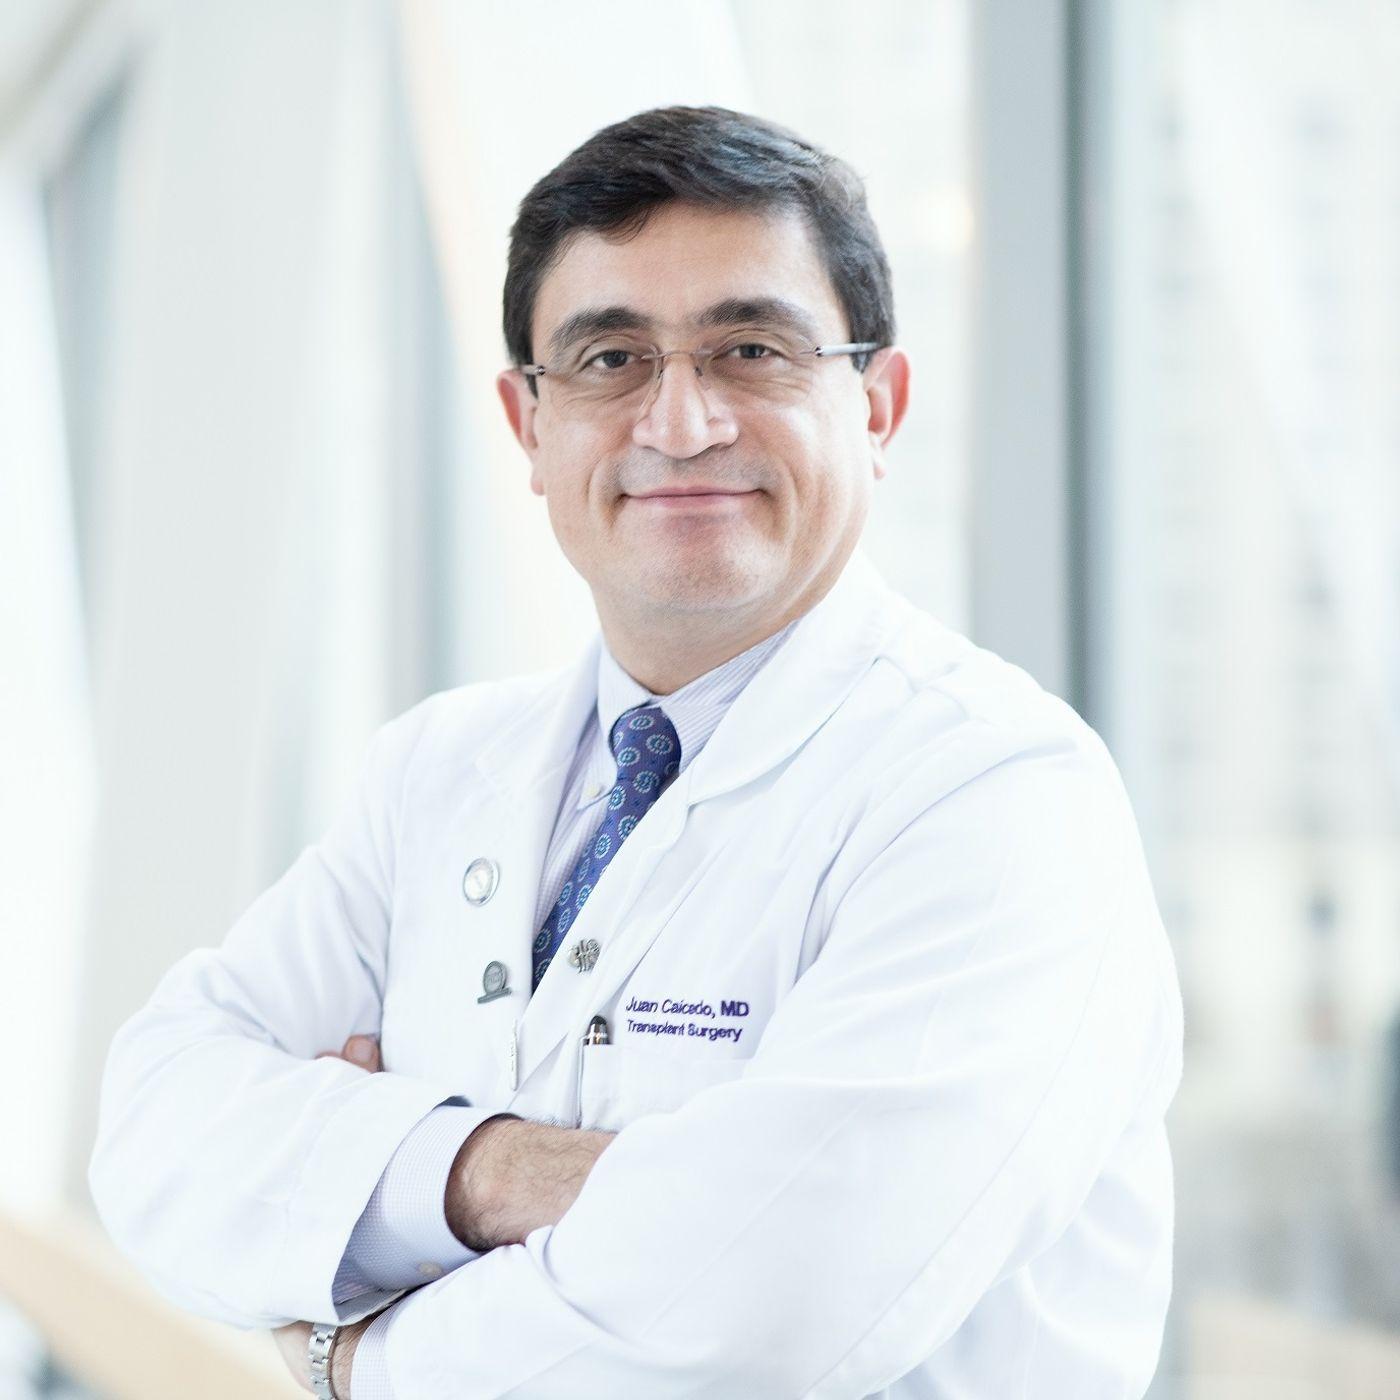 DONACION DE ORGANOS INVITADO DR. JUAN CAICEDO DE NORTHWESTERN HOSPITAL